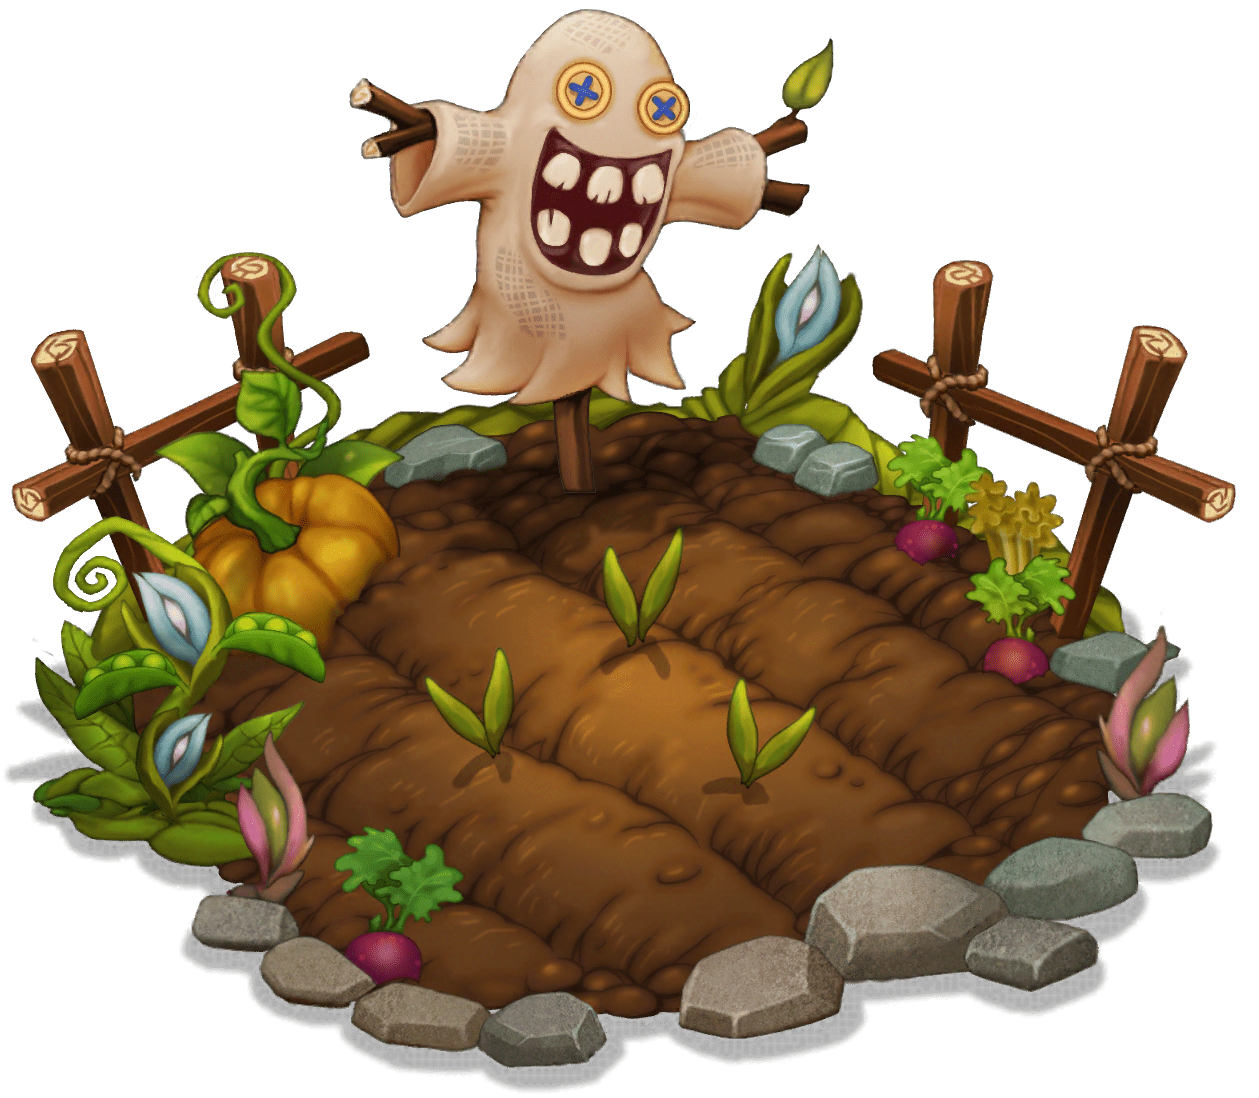 Garden Patch | My Singing Monsters Wiki | FANDOM powered by Wikia